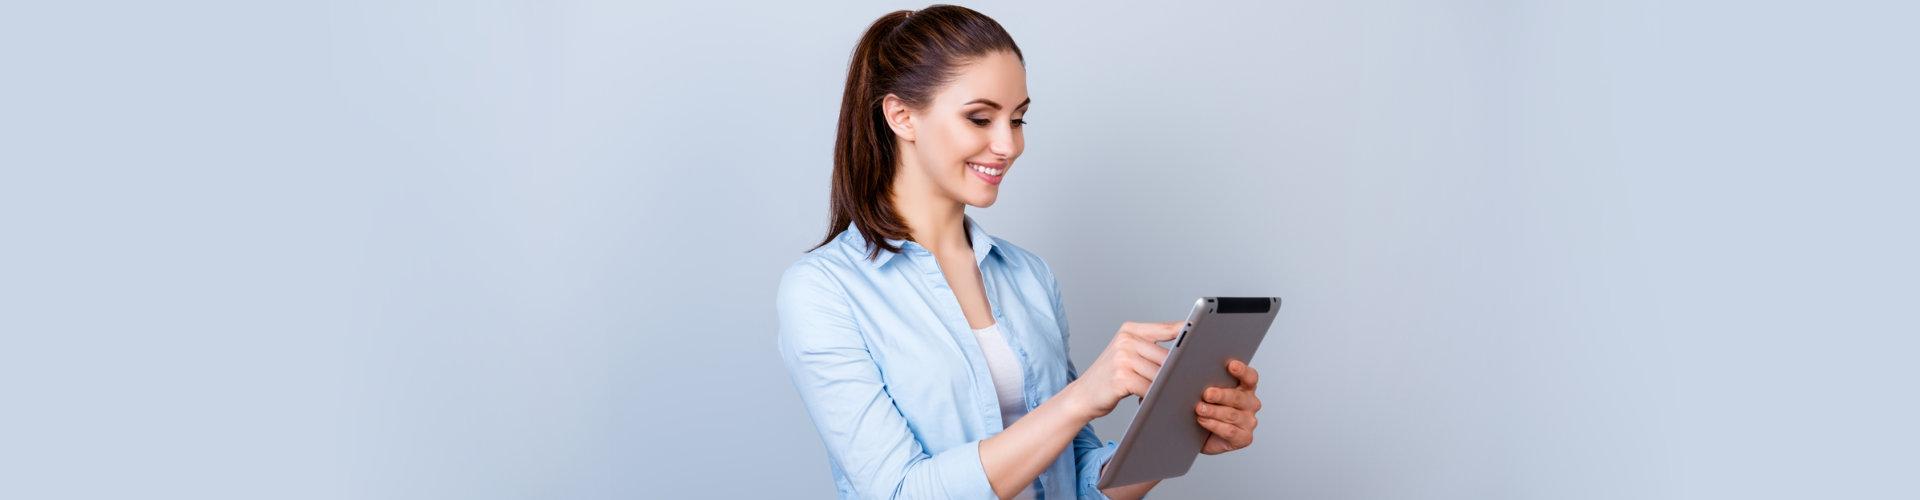 woman using her ipad